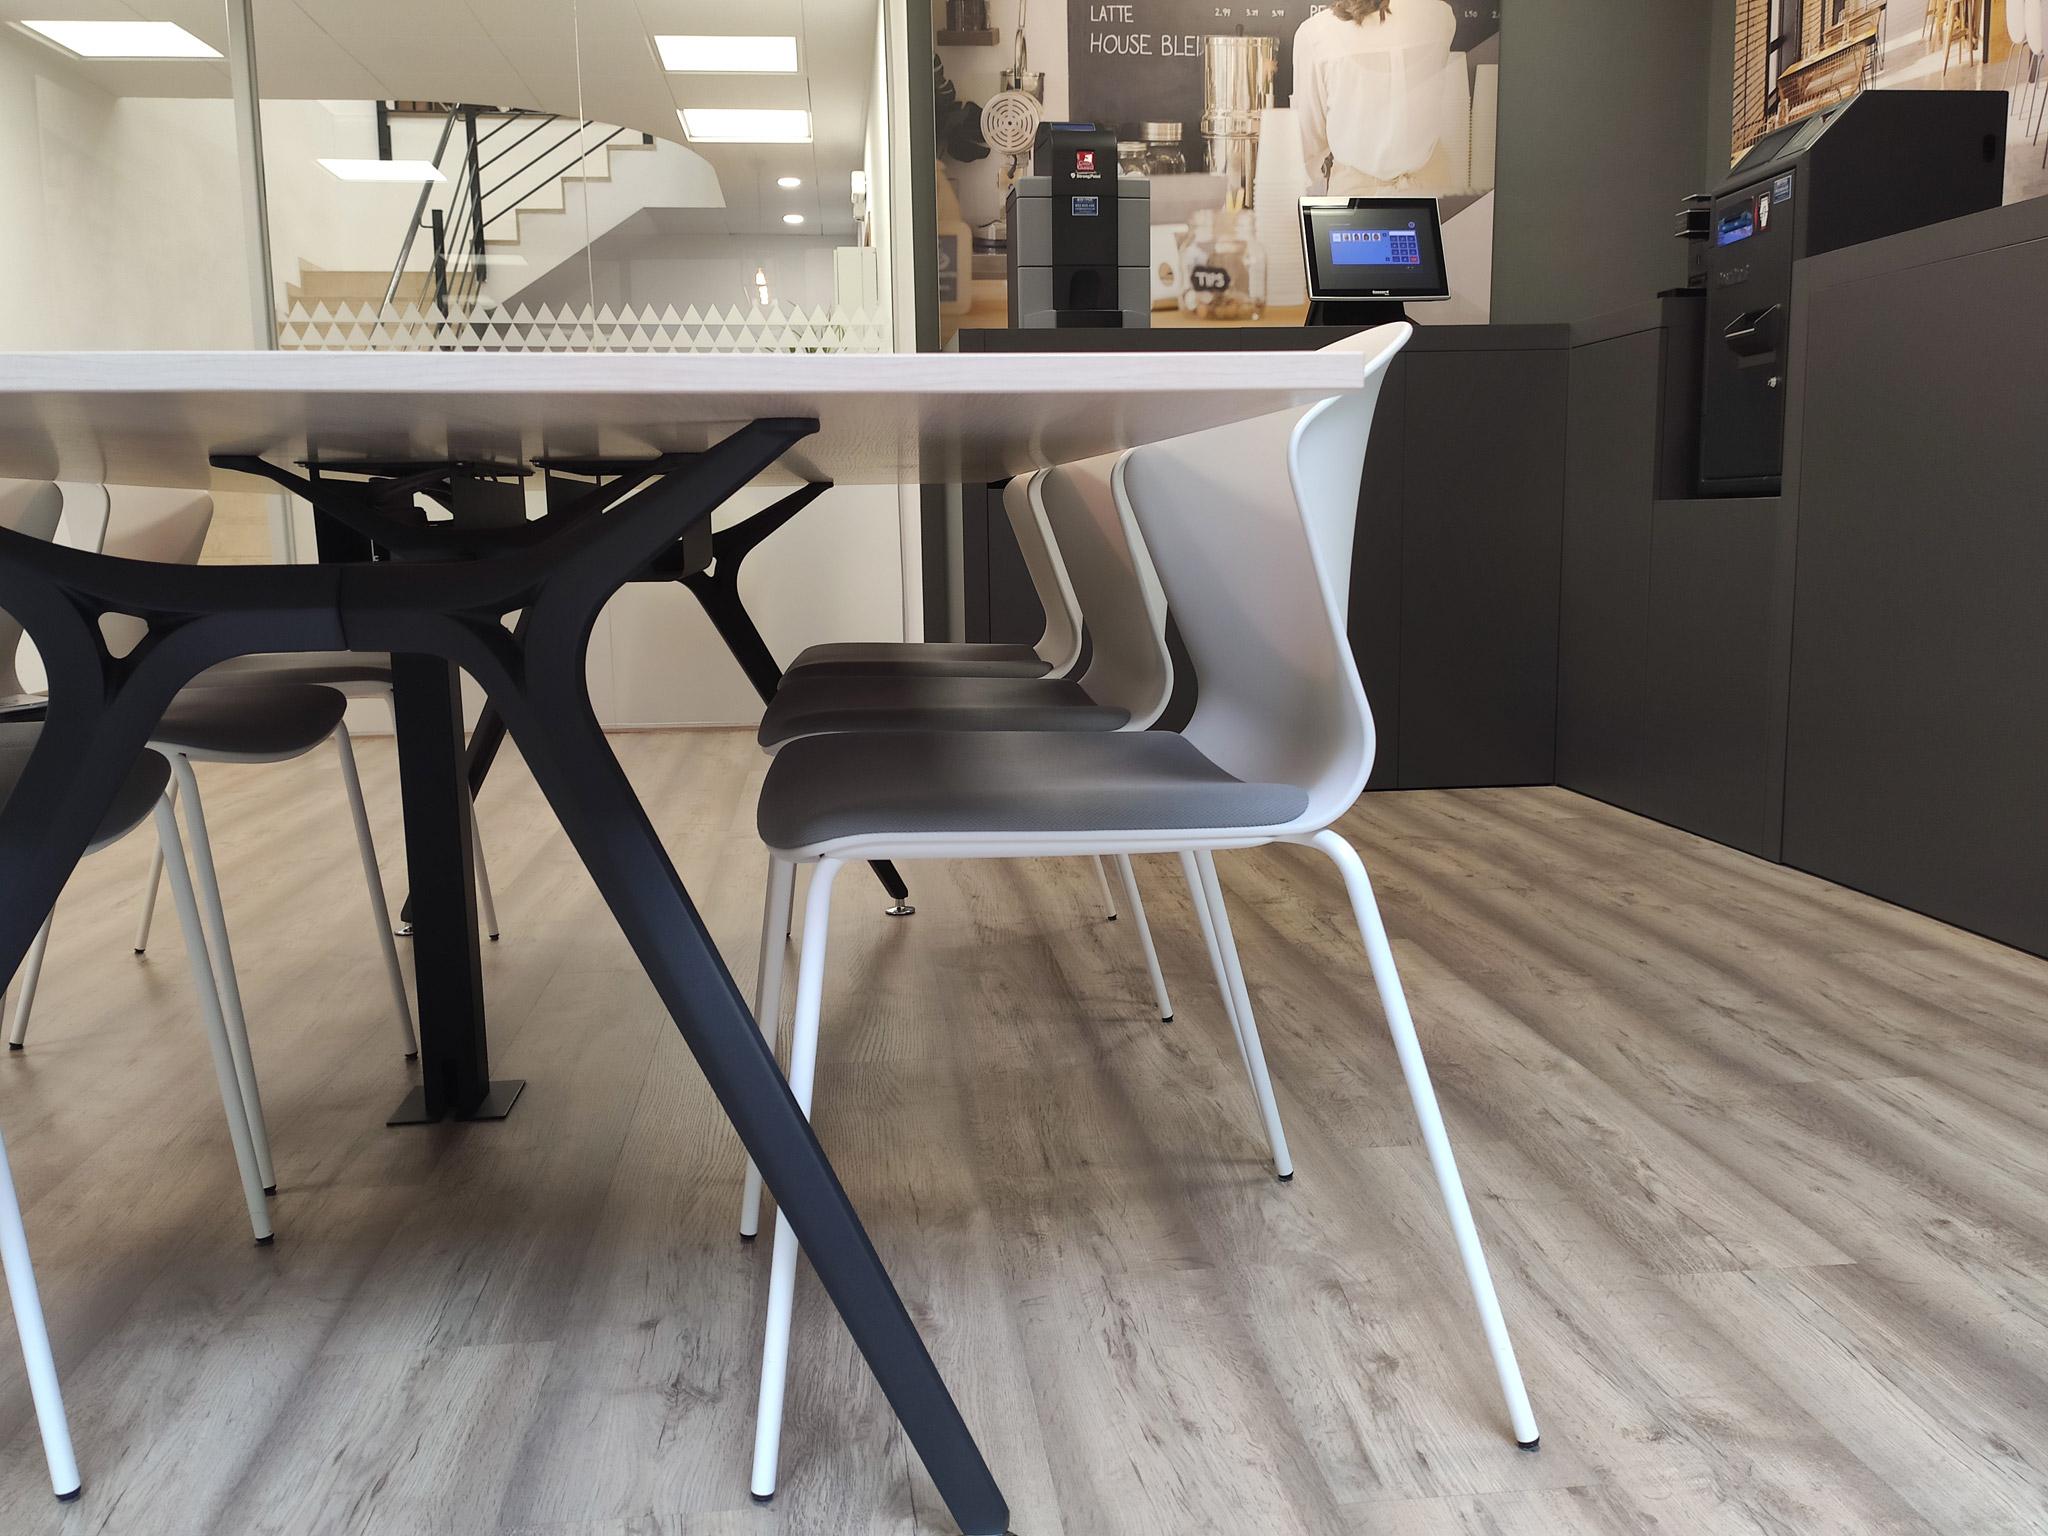 atelier4-anna-junca-interiorista-arquitectura-interior-disseny-interiorisme-banyoles-girona-barcelona-costa-brava-reforma-oficines-showroom-edyma-8